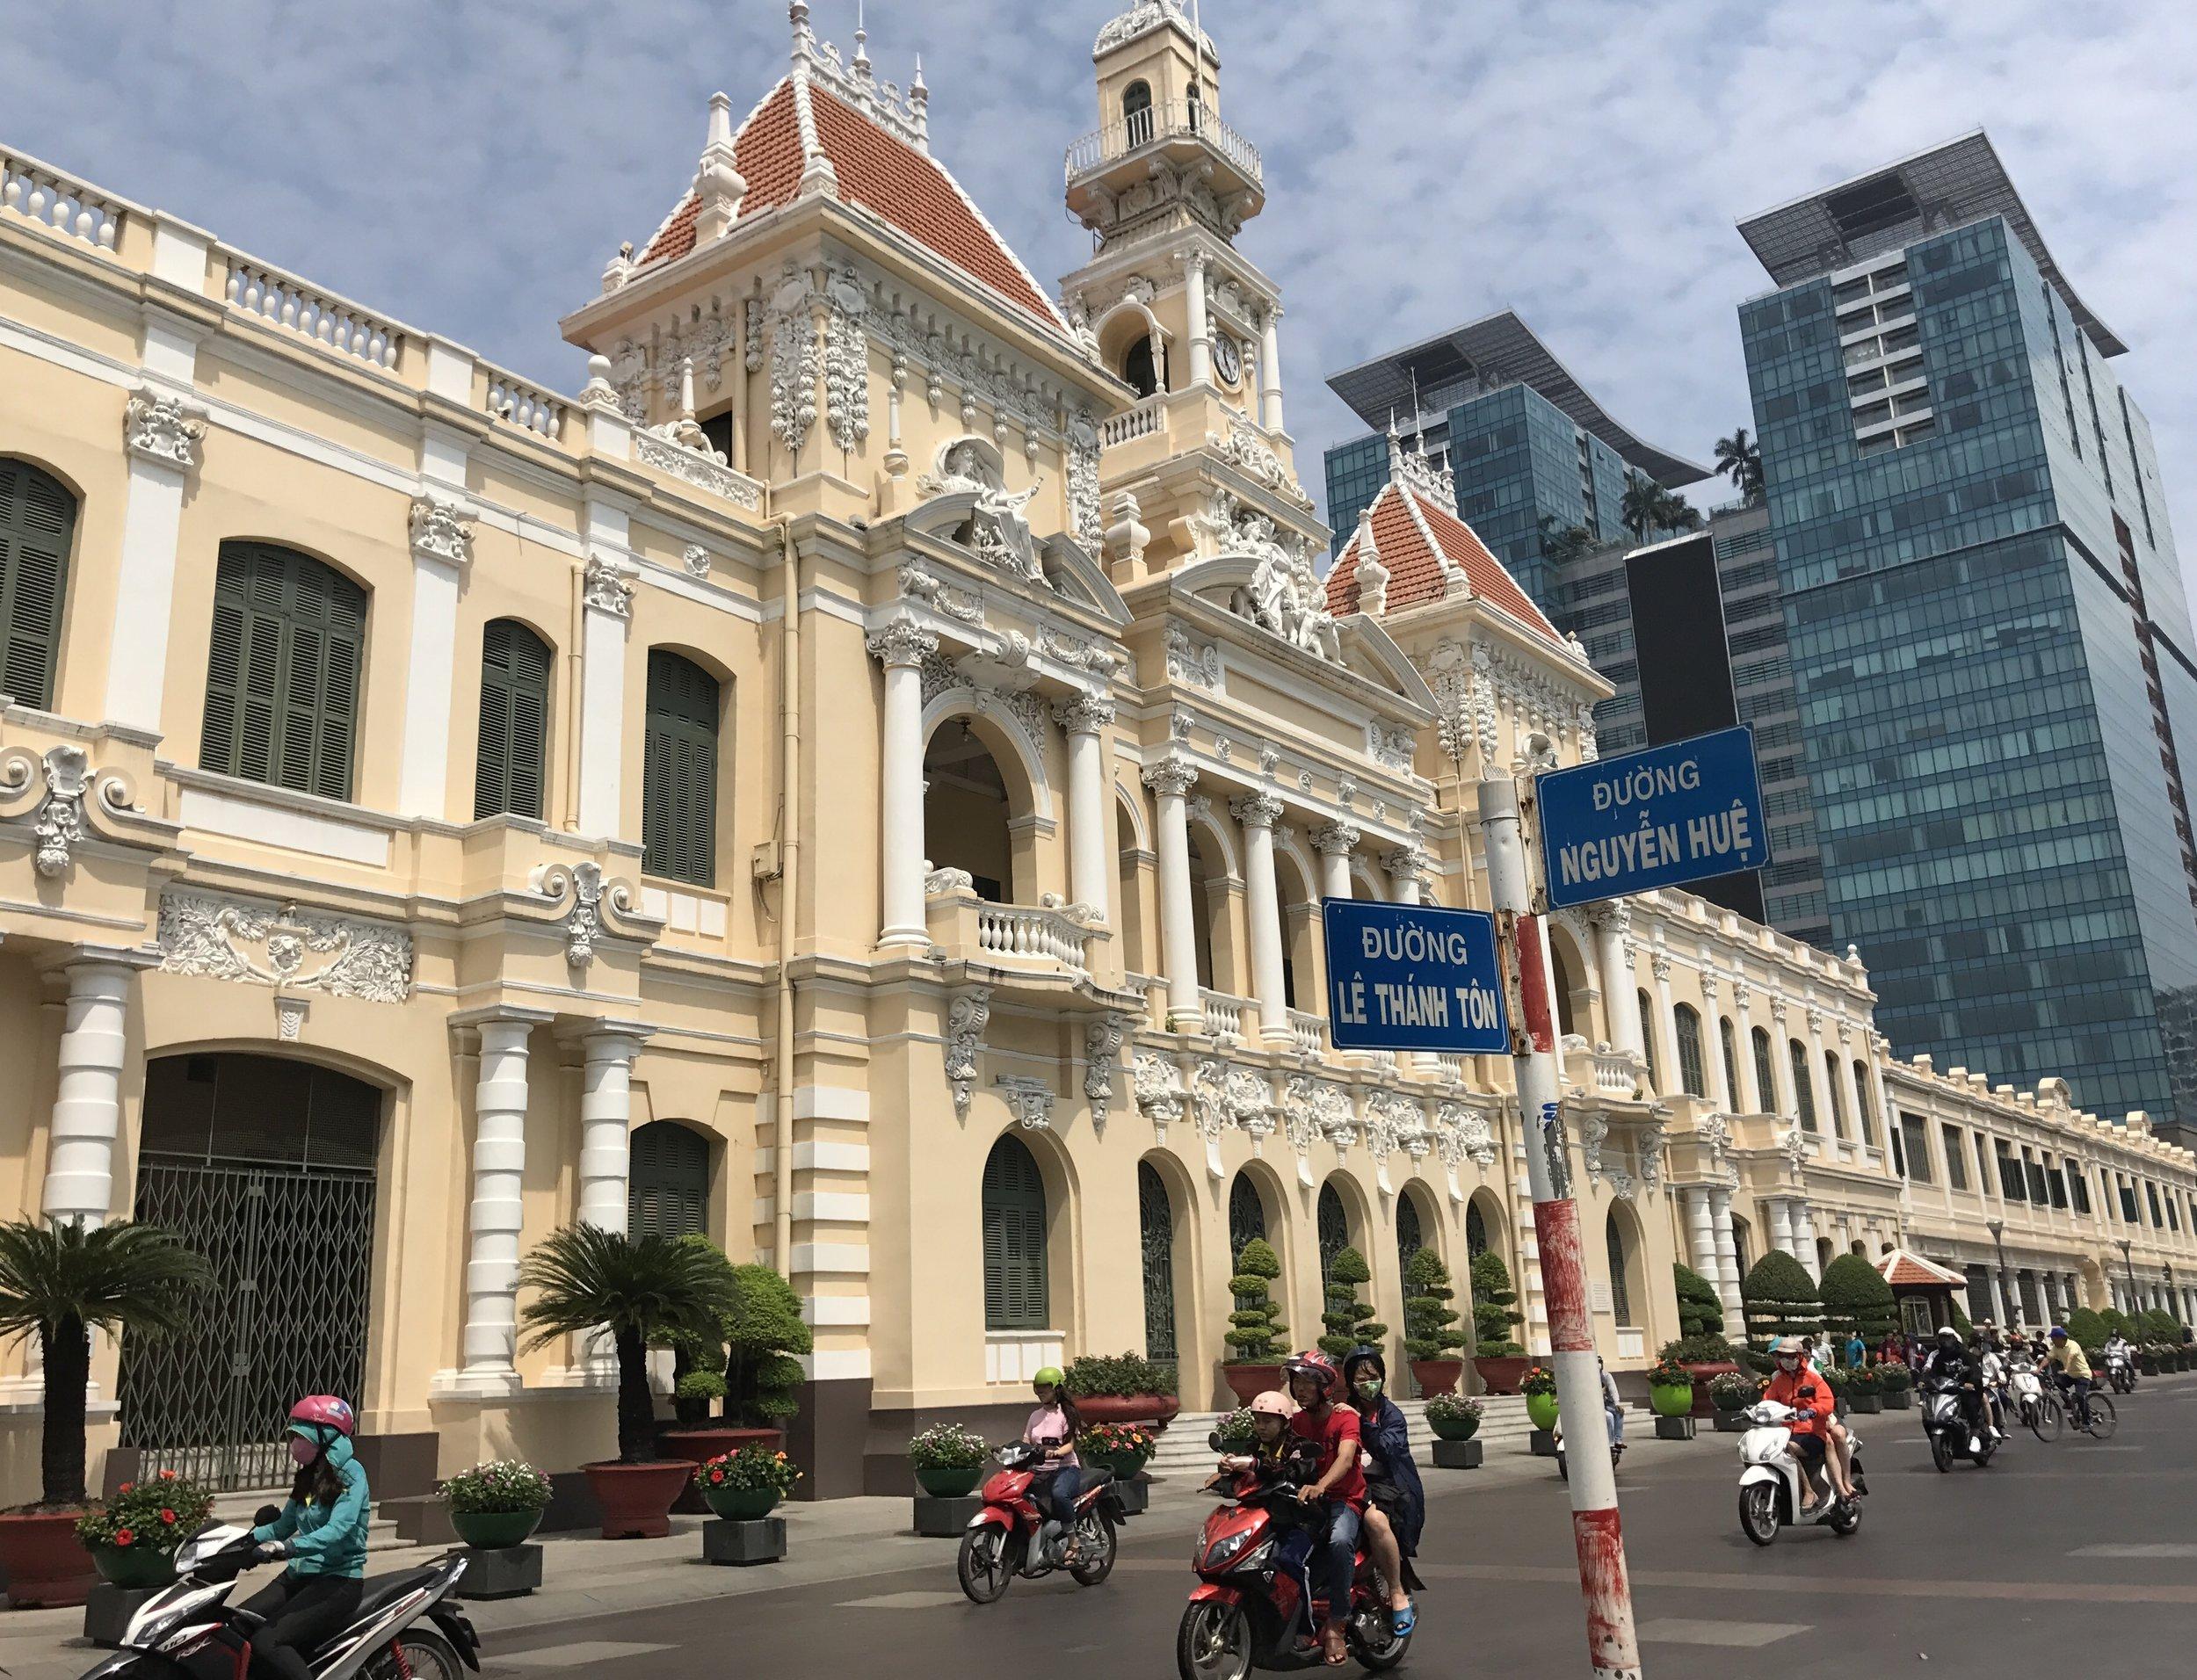 Image: Ho Chi Minh City - Saigon City Hall